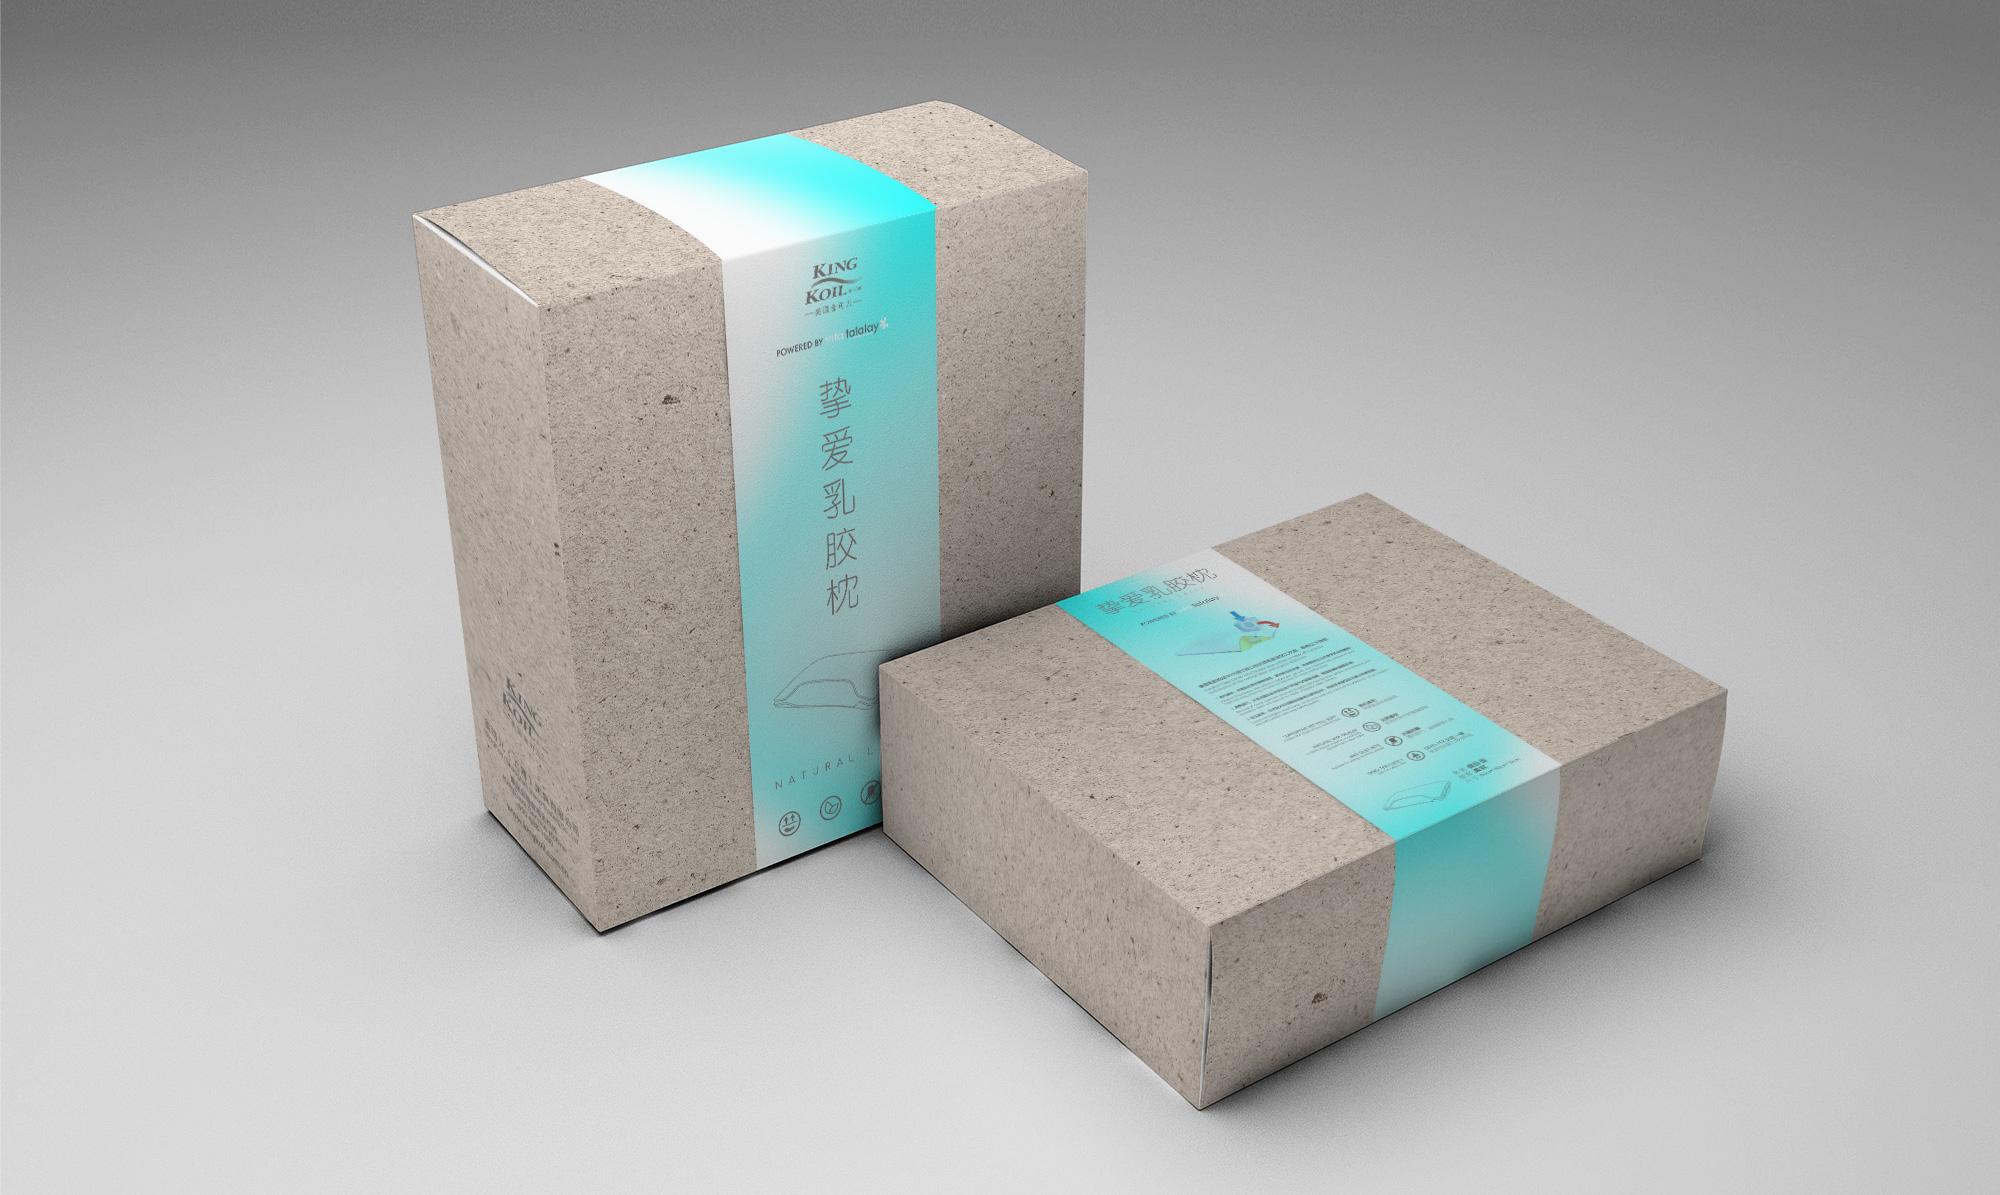 quentin_paquignon-packaging-kingkoilchina_03.jpg